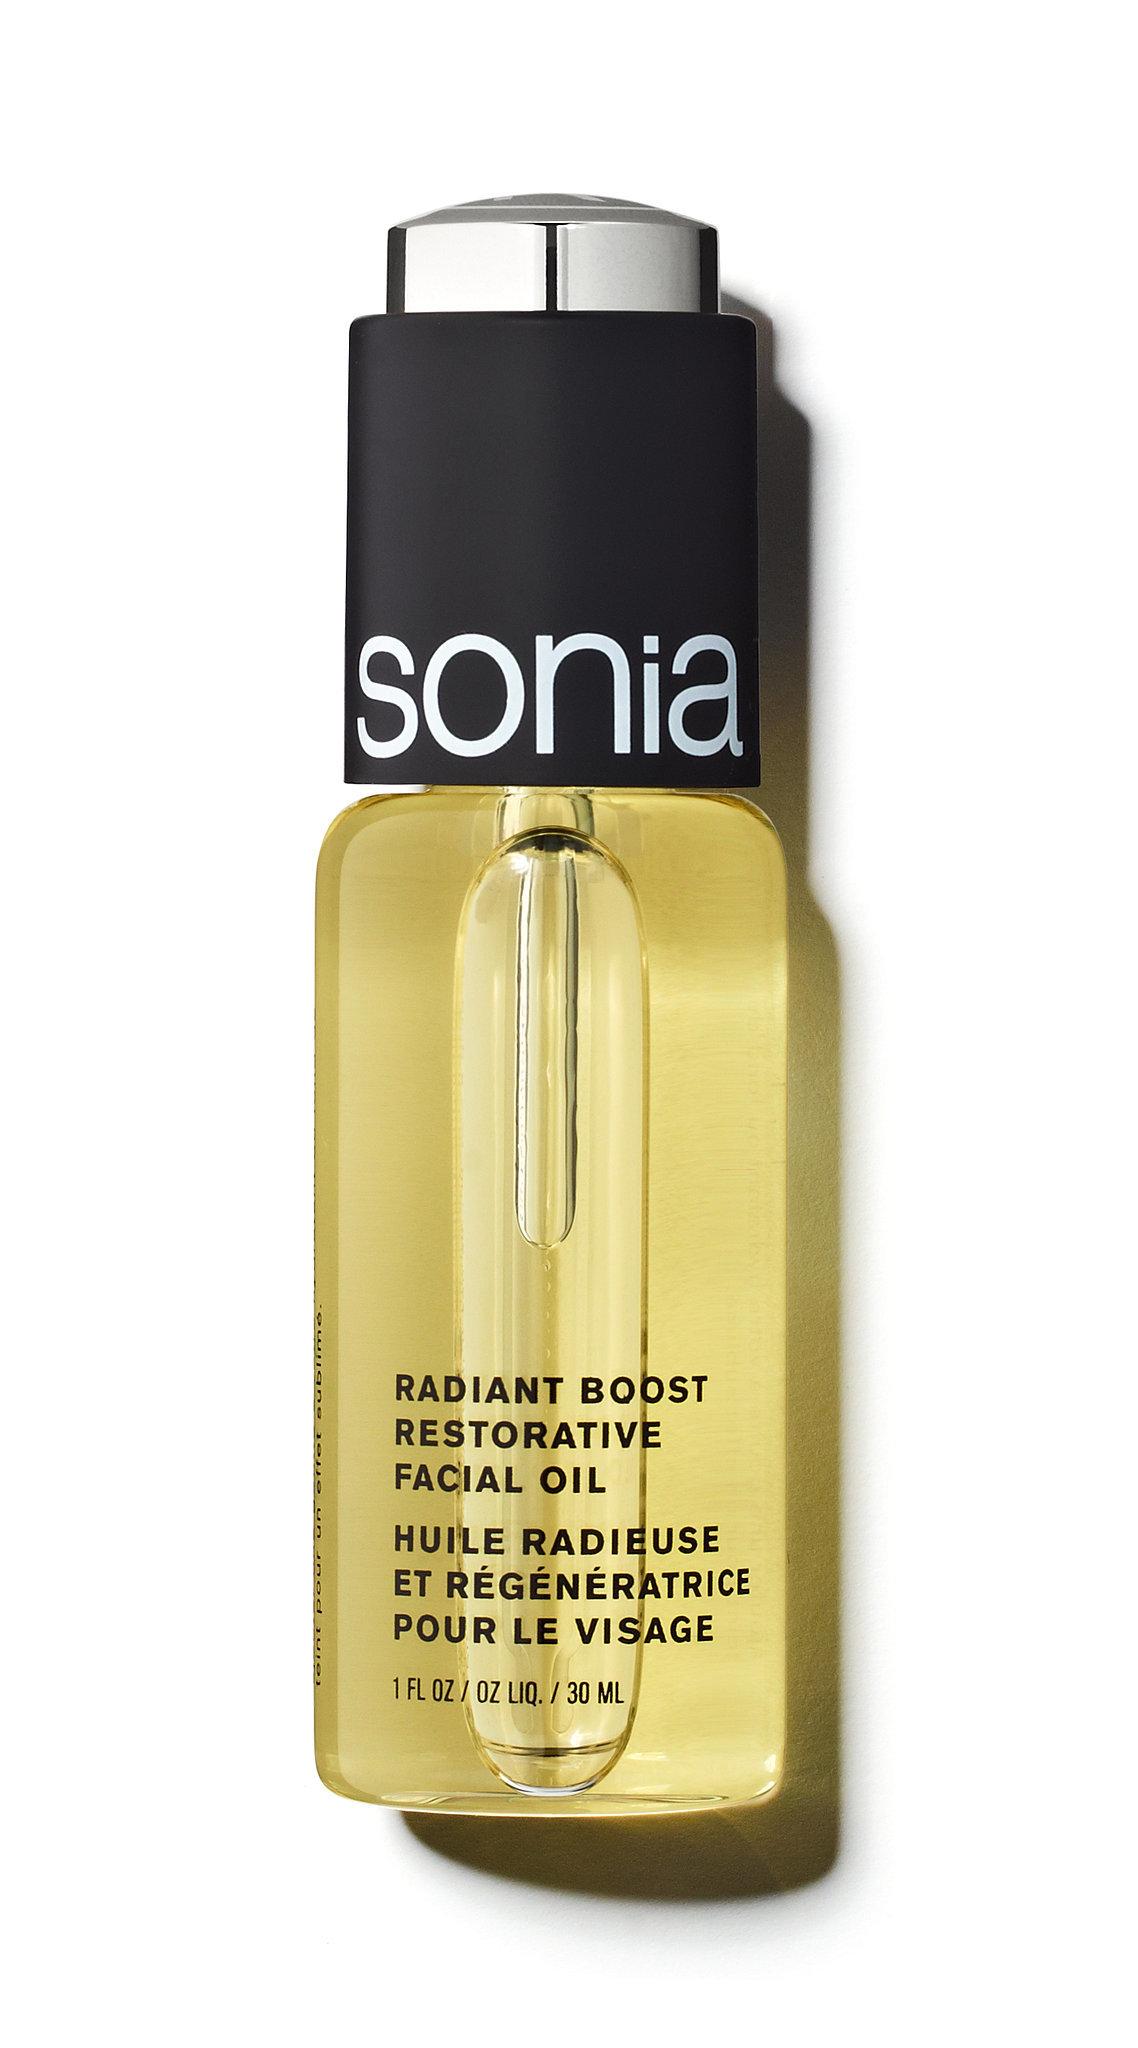 Radiant Boost Restorative Facial Oil, $15